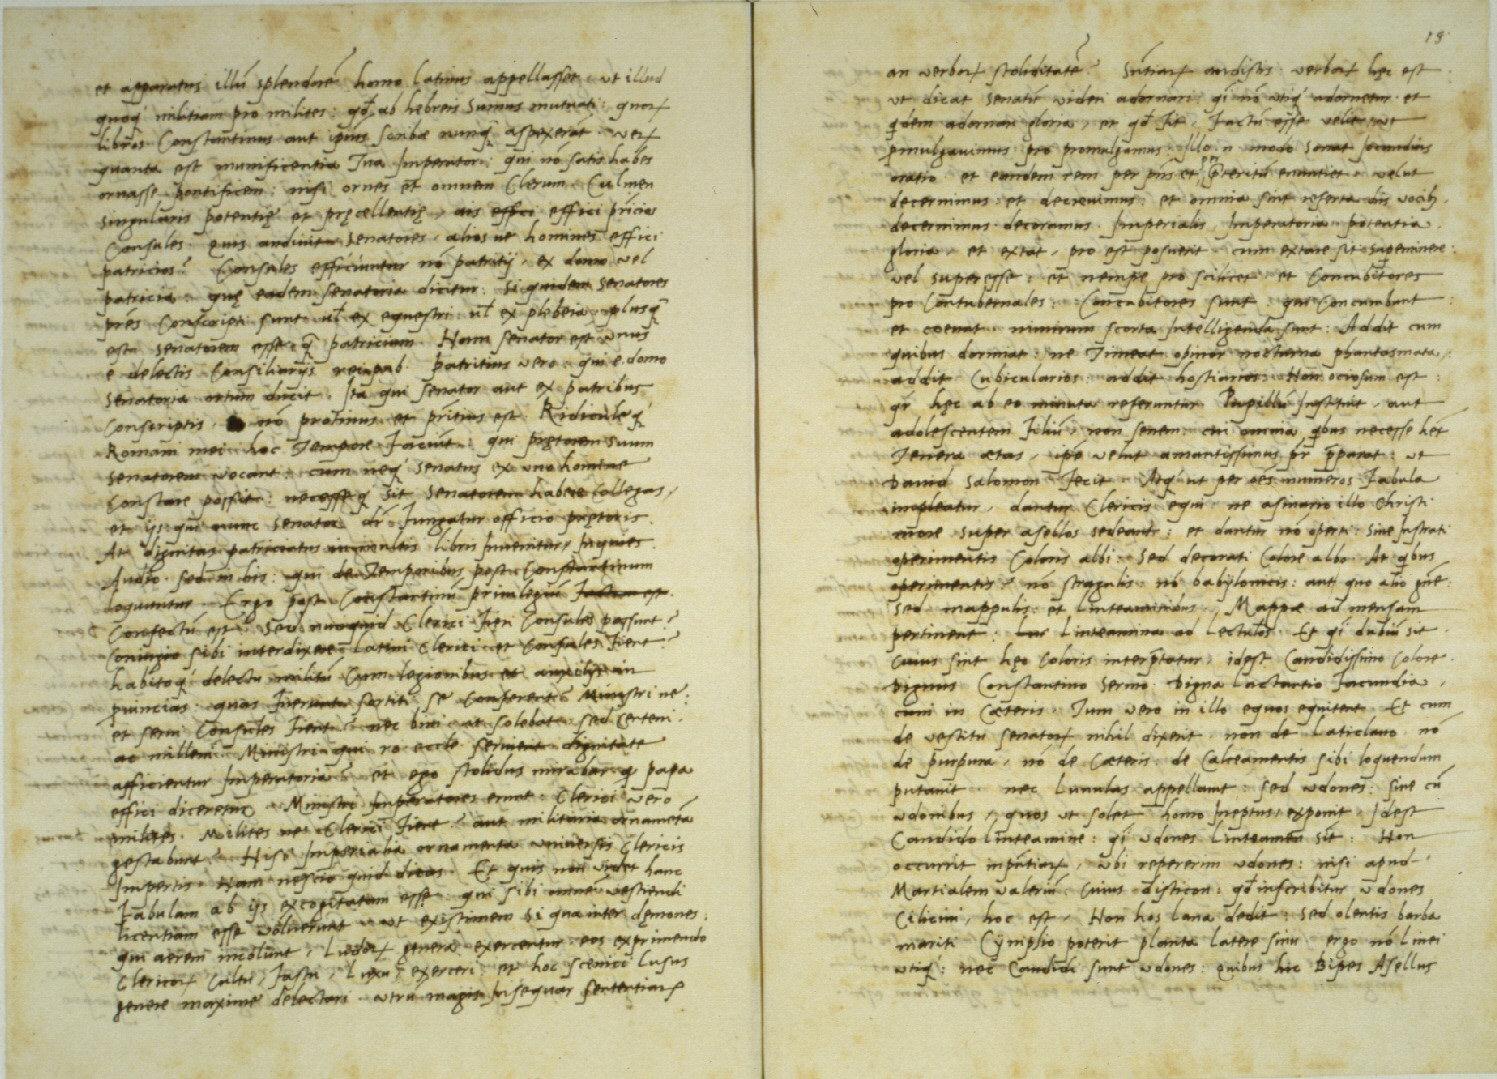 Lorenzo Valla, Declamatio (on the Donation of Constantine